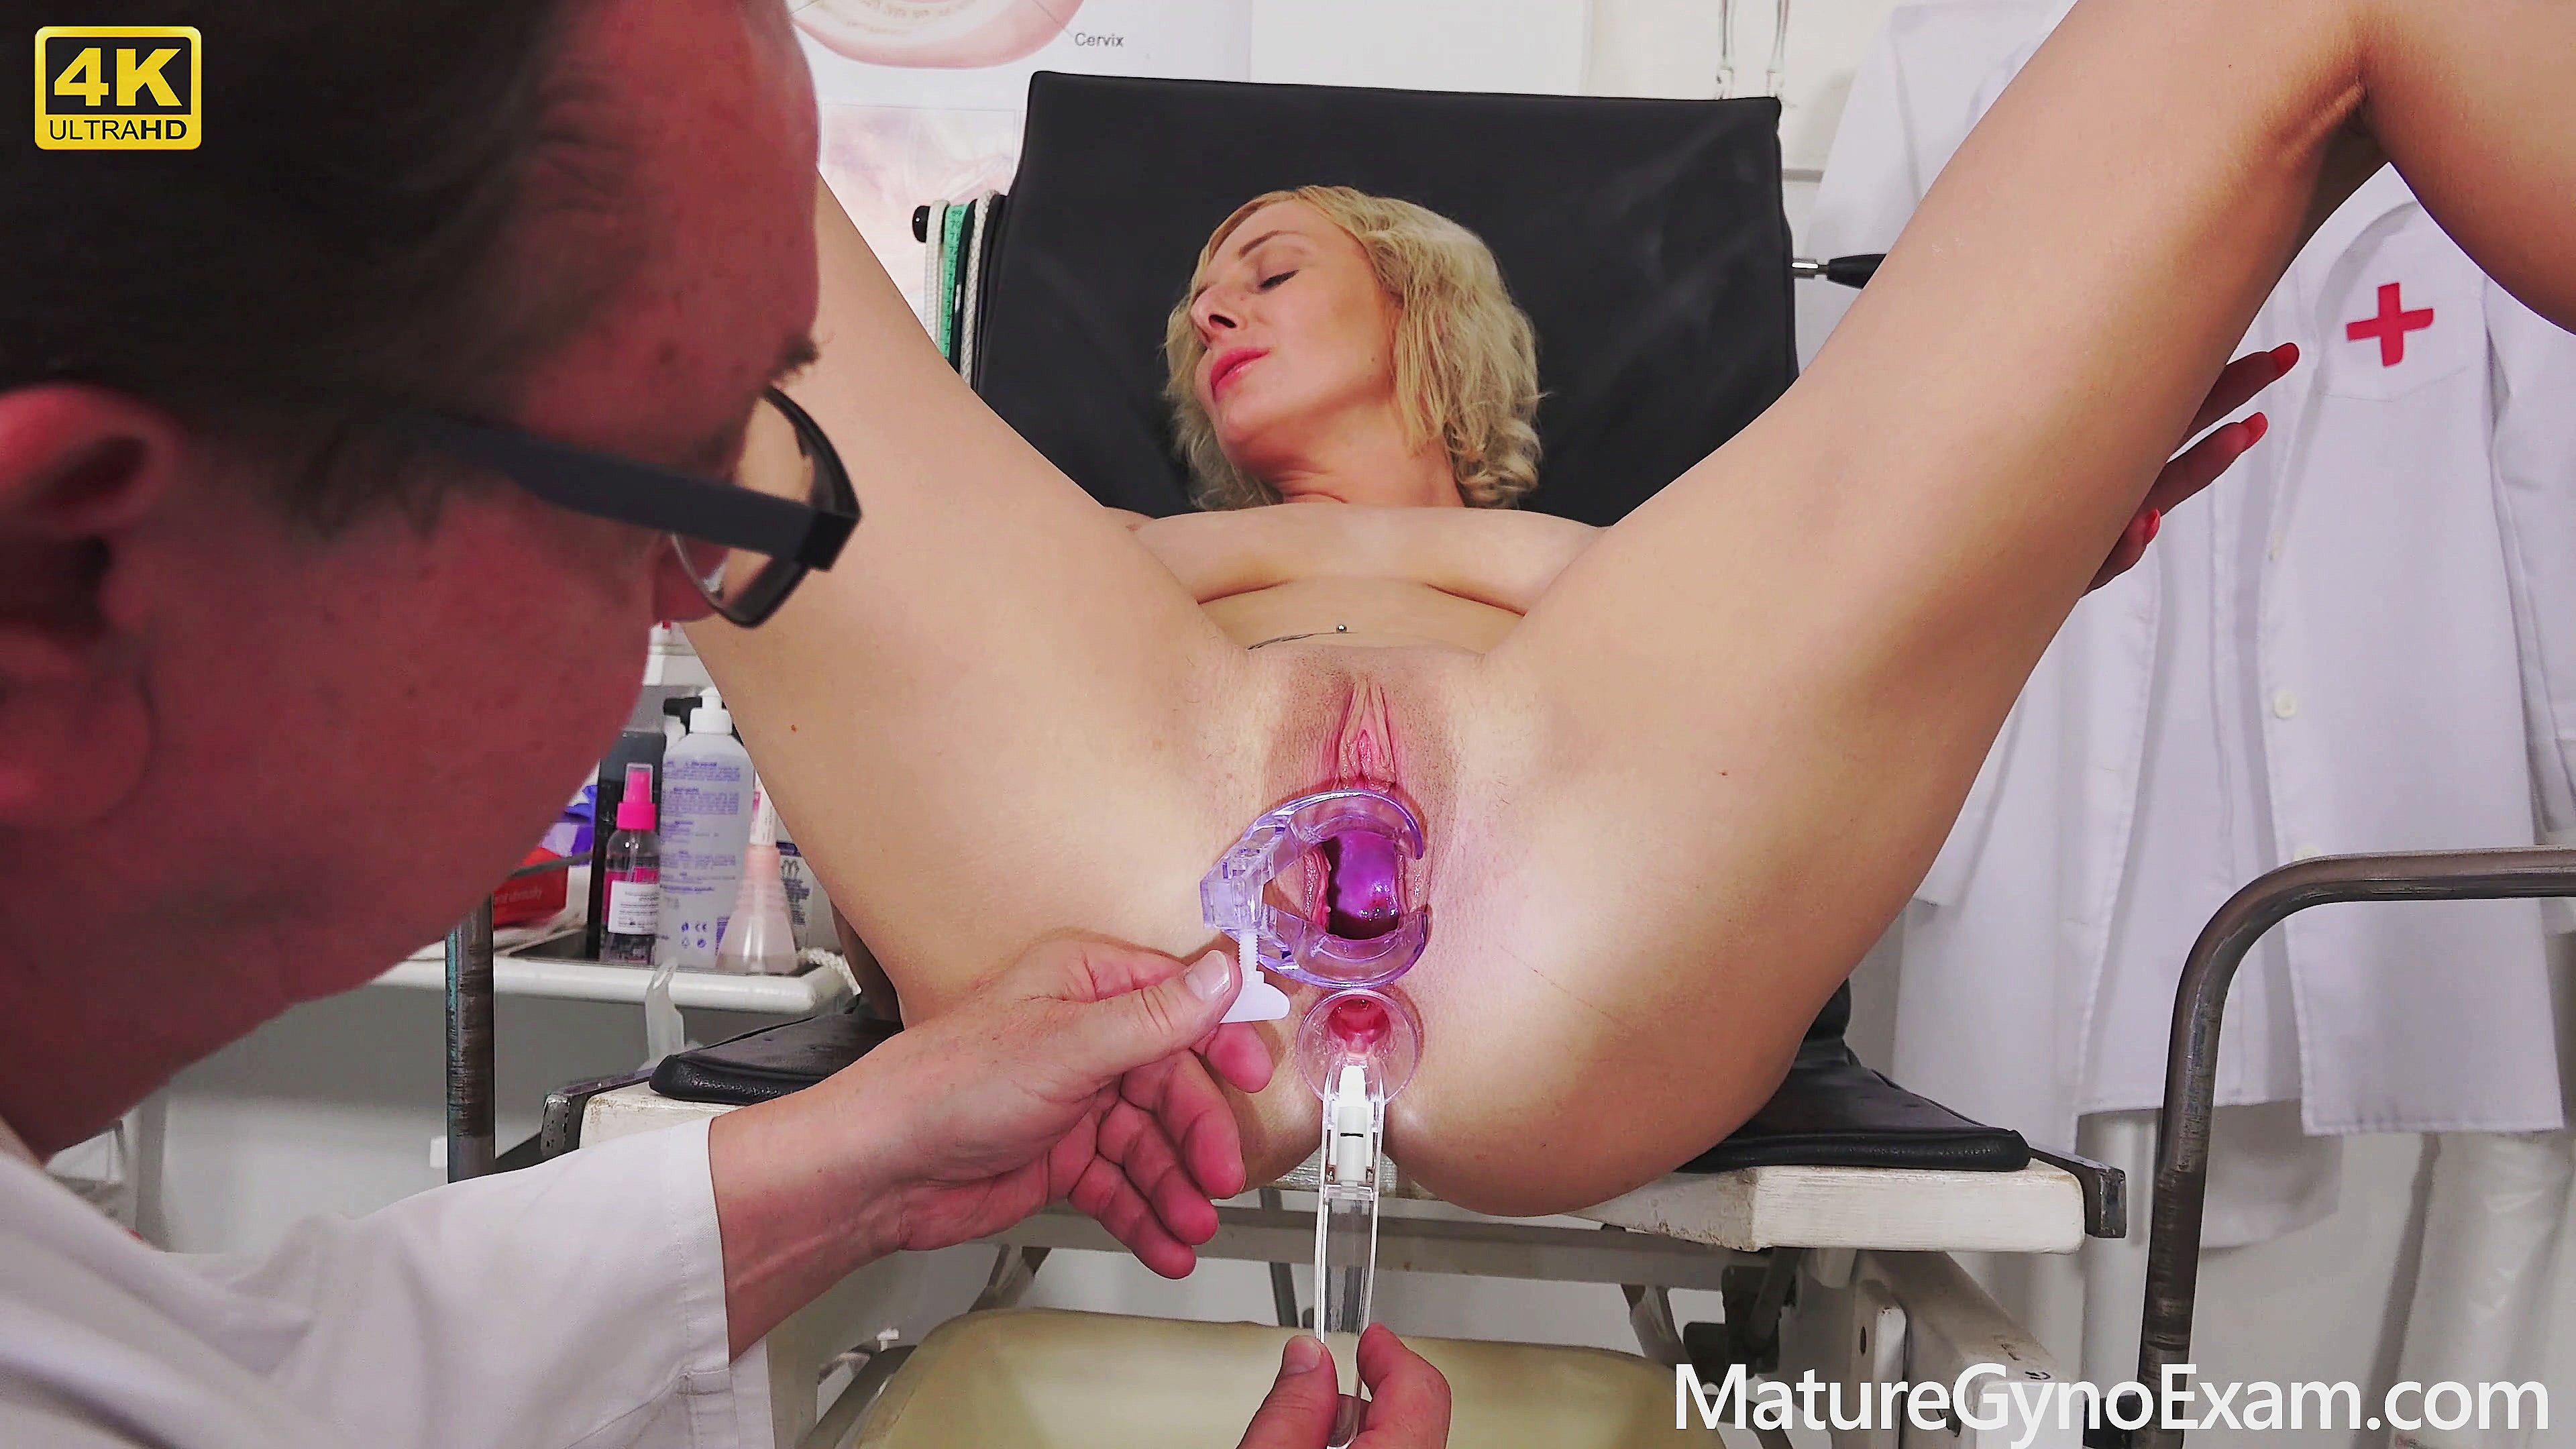 exam guide rectal porn s Women